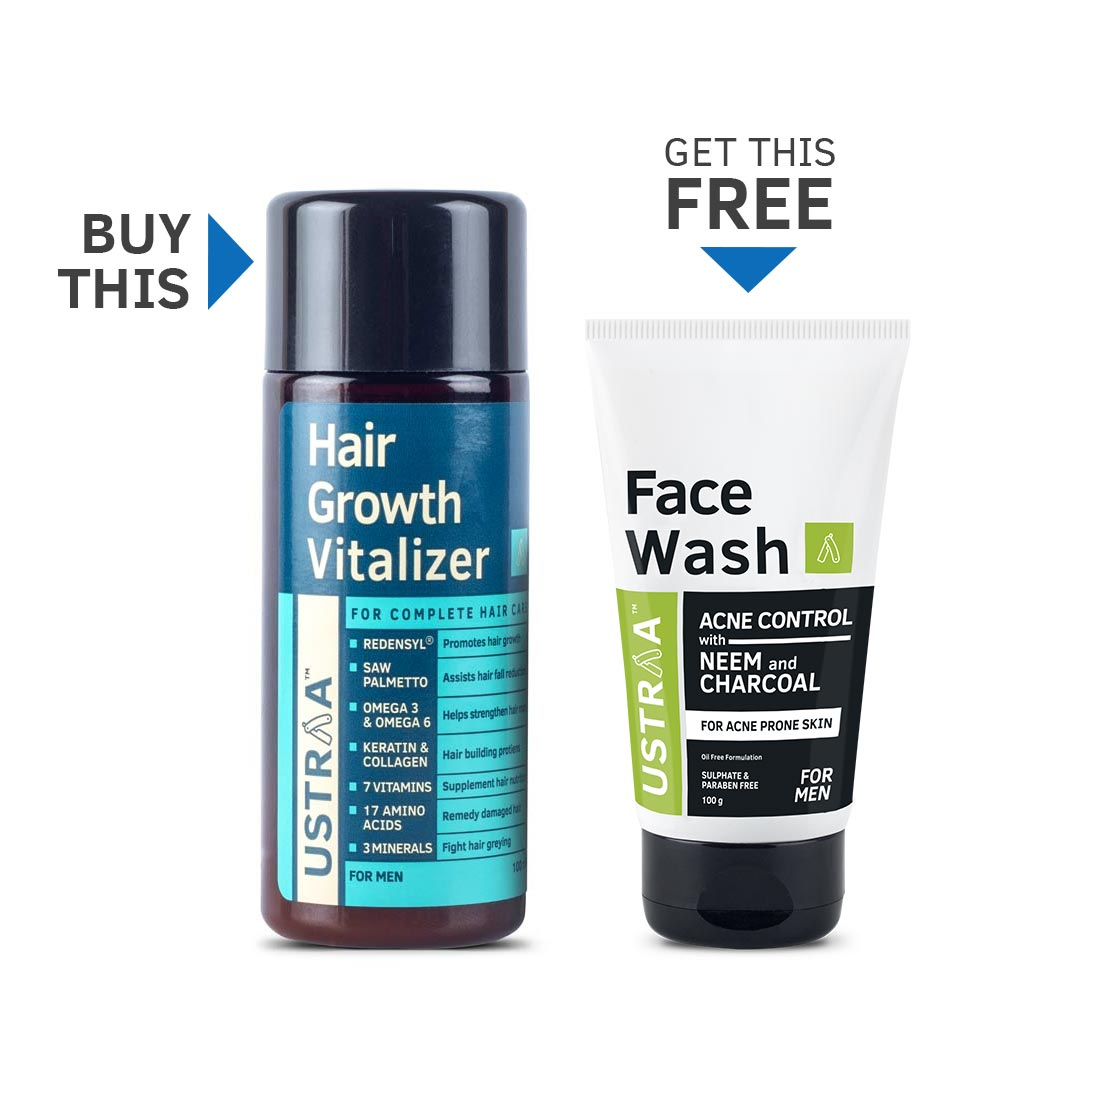 Hair Growth Vitalizer  (Get Neem & Charcoal Facewash Free)